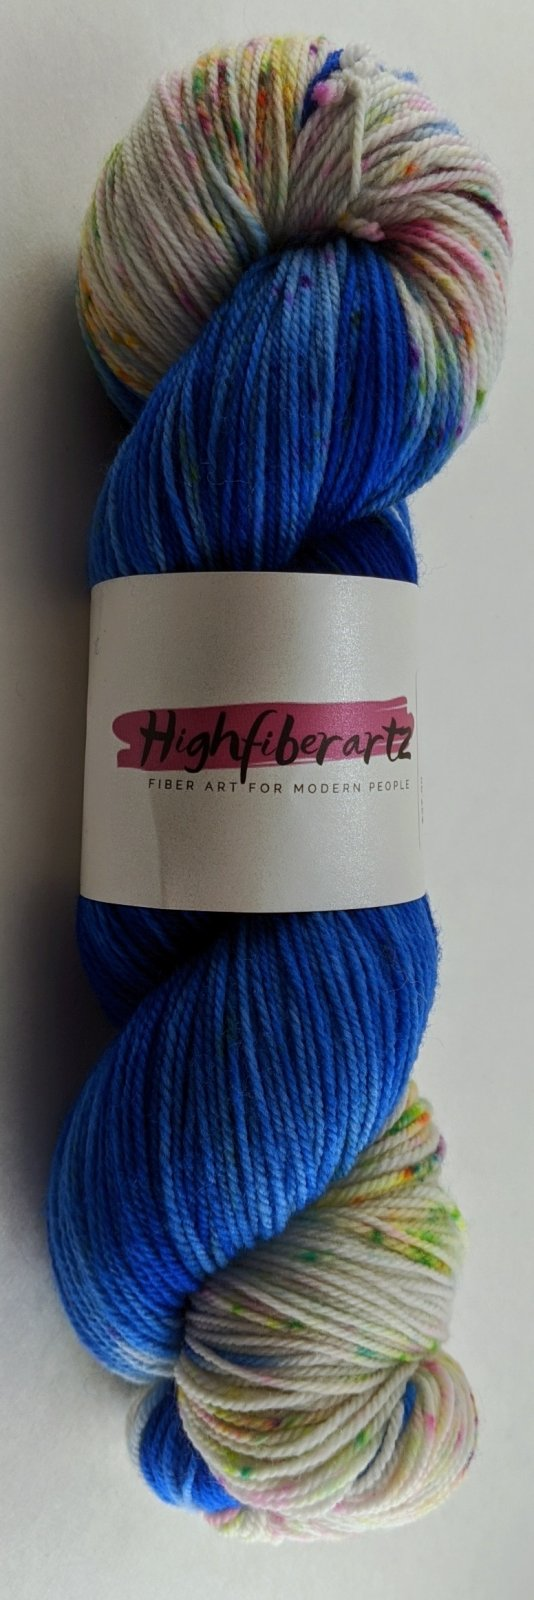 Highfiberartz Targhee Sock